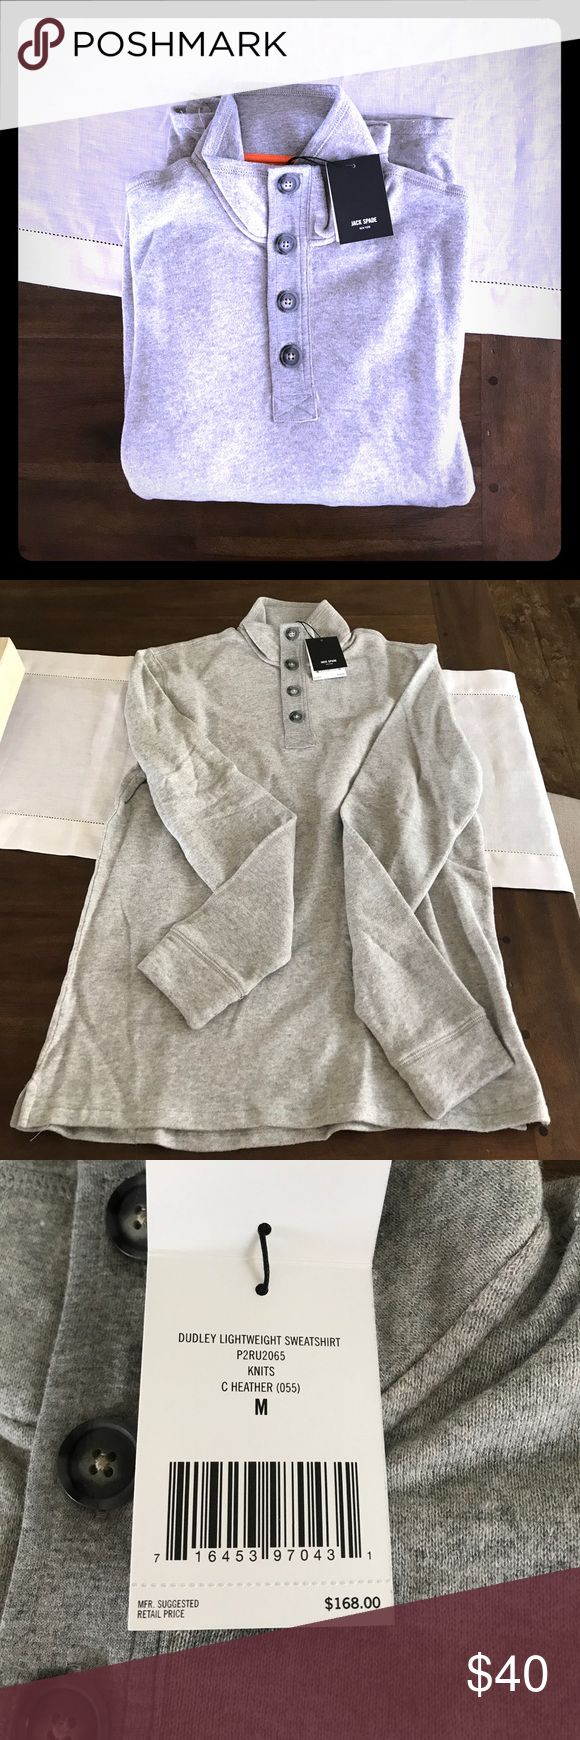 "JAKE SPADE Dudley Lightweight Sweatshirt M NWT (in factory bag) JACK SPADE NEW YORK Dudley Lightweight Medium Sweatshirt. Garment measurements: chest 50"", back length 28"". 100% cotton. Jack Spade Shirts Sweatshirts & Hoodies"